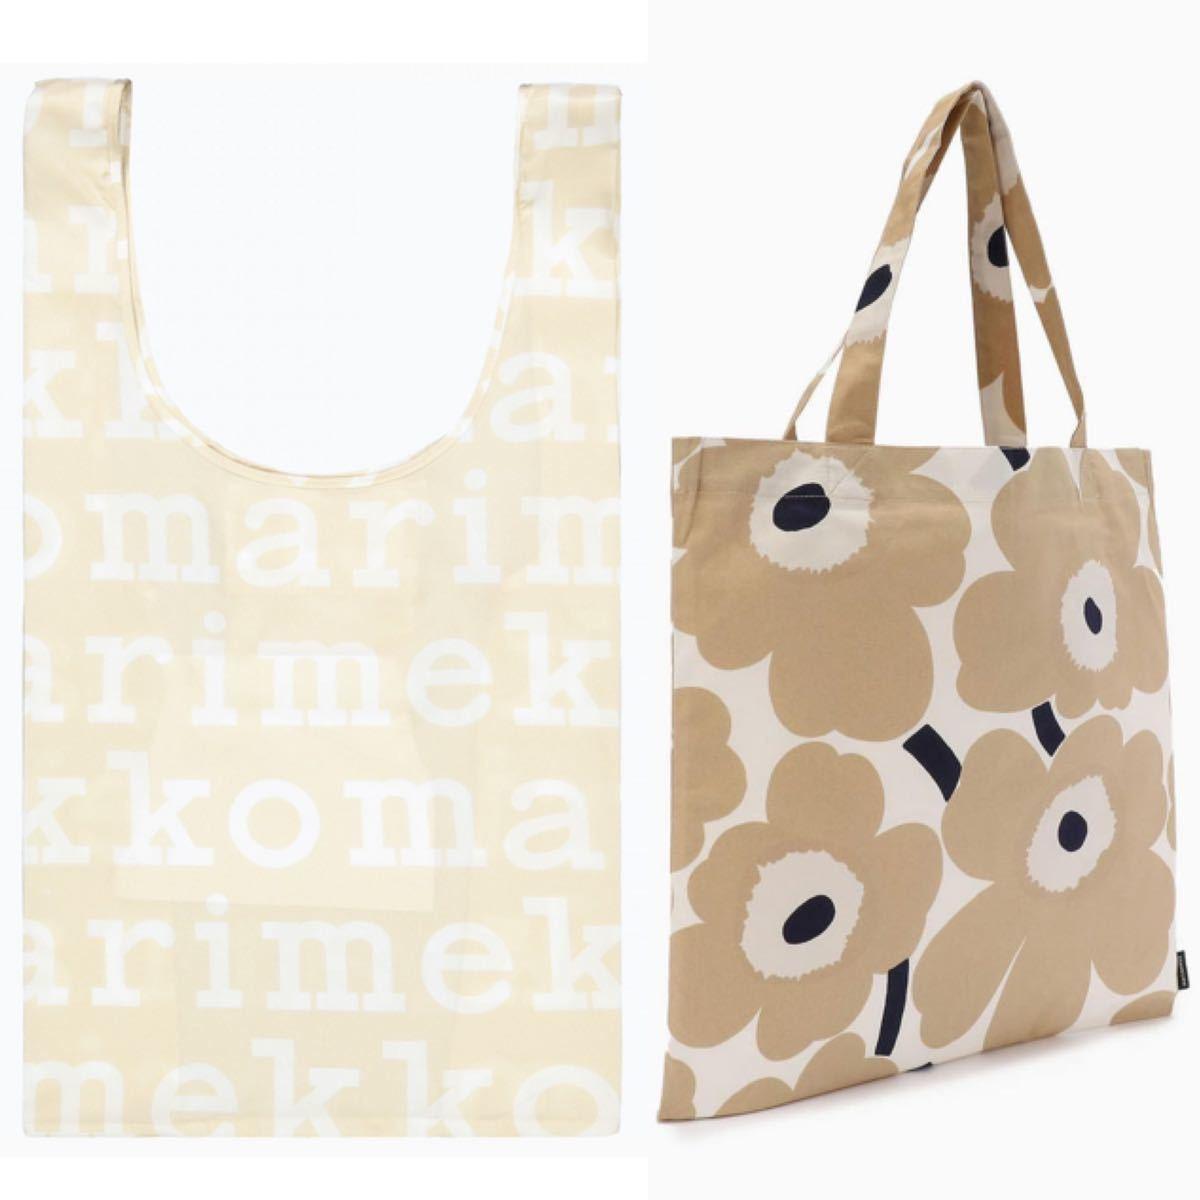 marimekko マリメッコ 日本未発売スマートバッグ+完売トートバッグ 新品